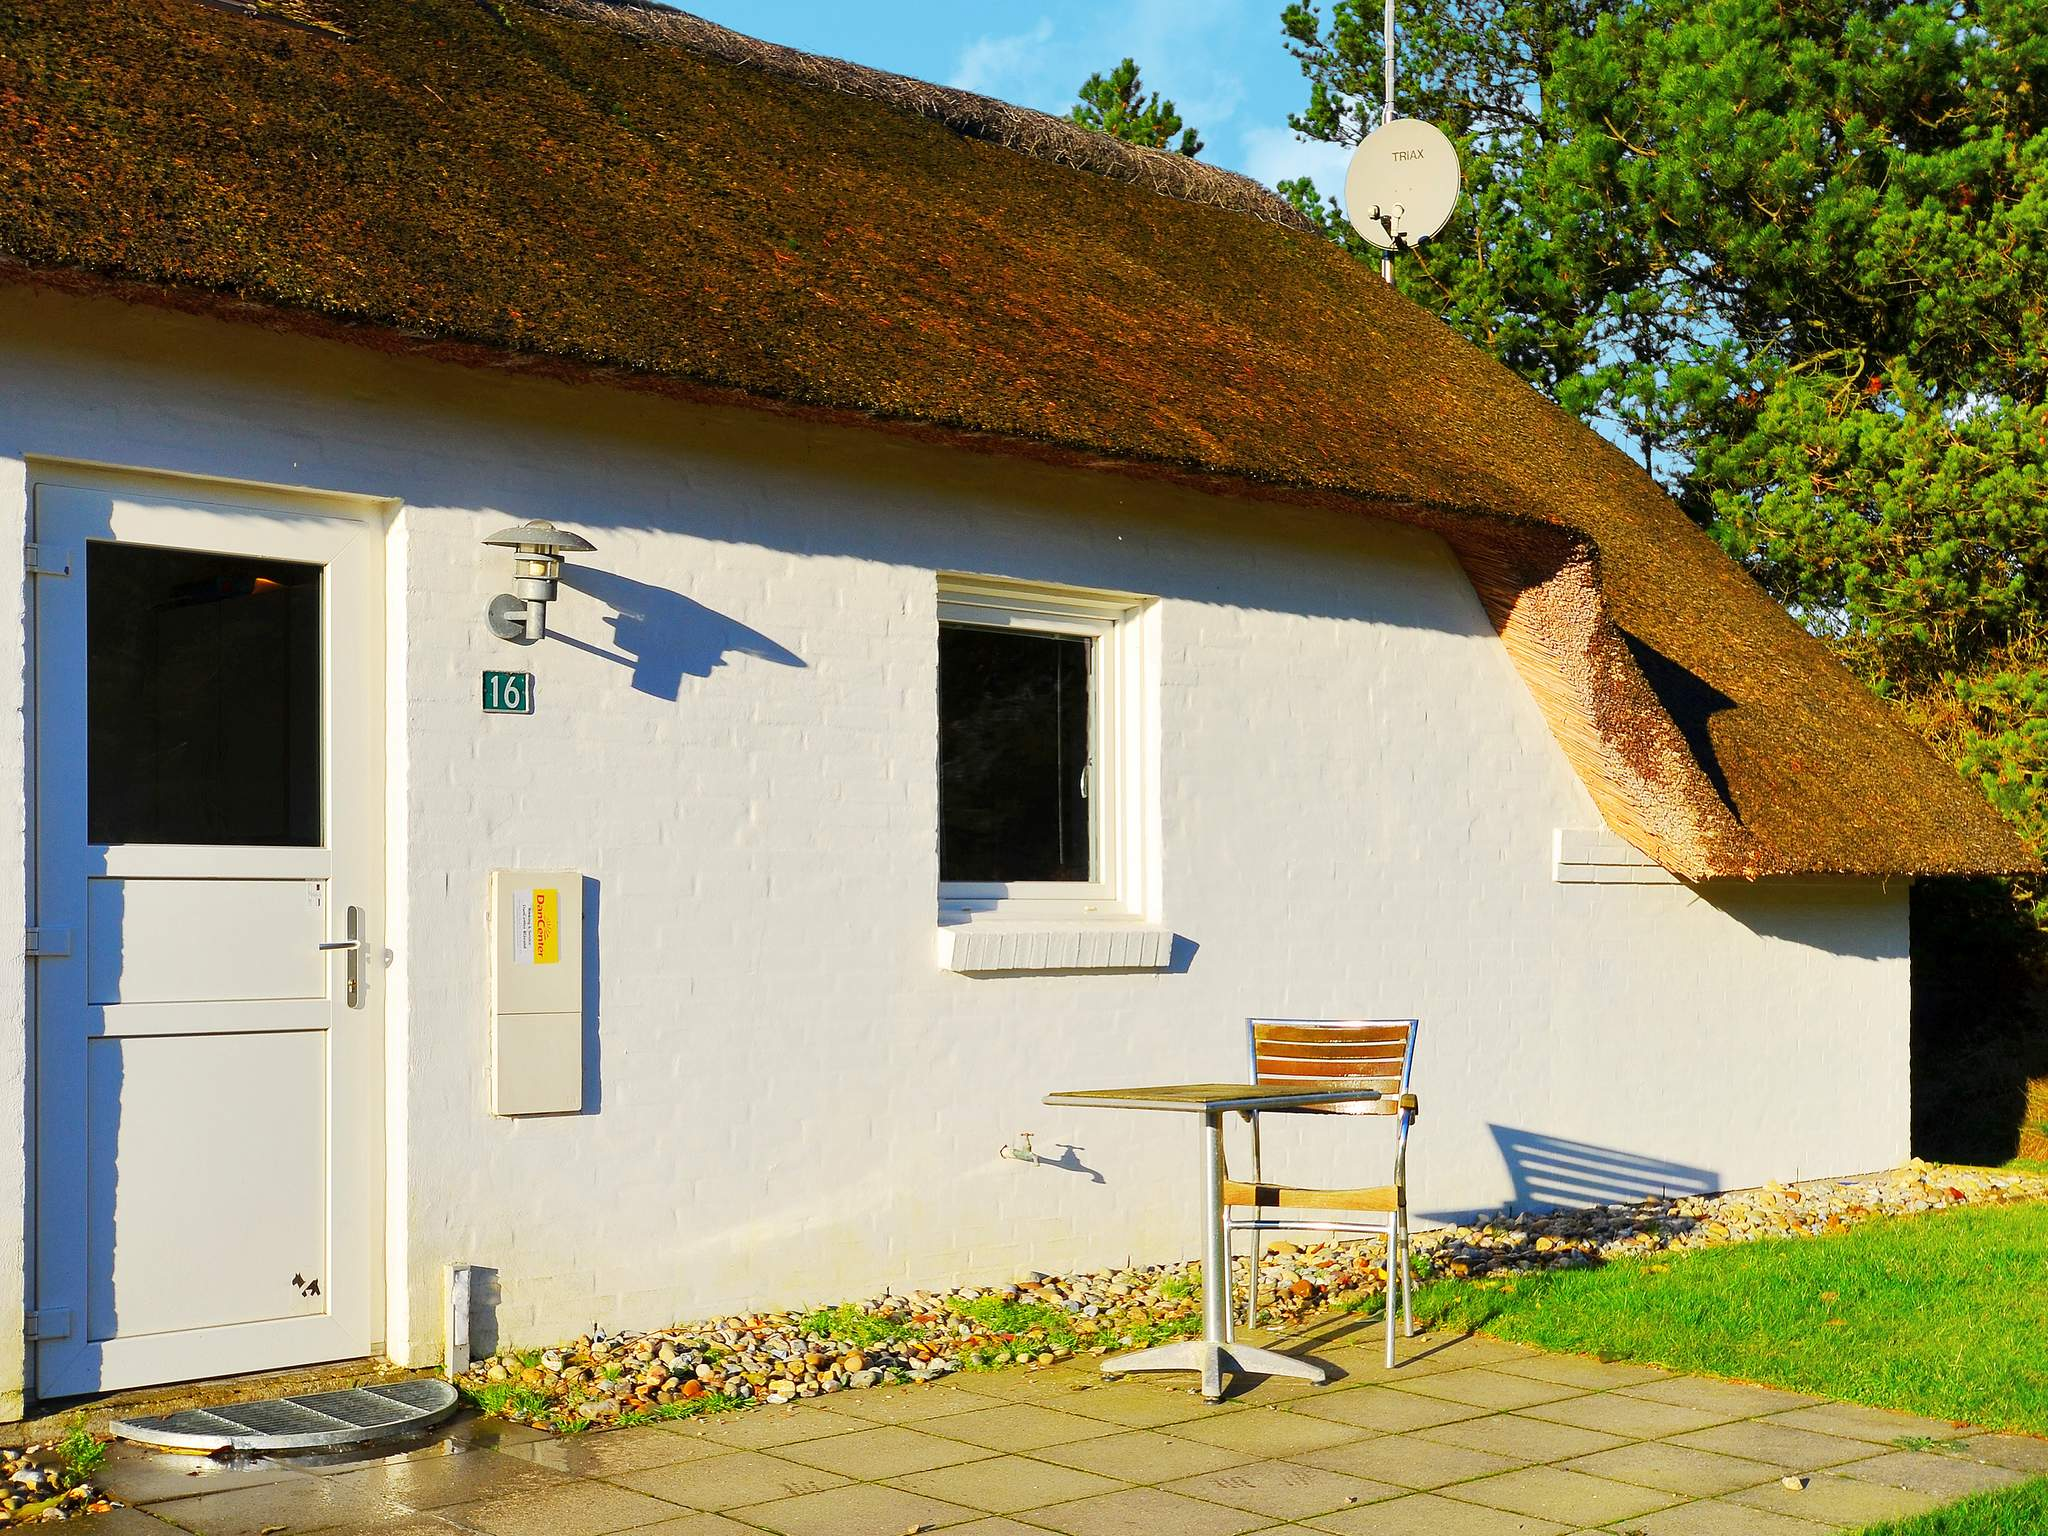 Ferienhaus Blåvand (125884), Blåvand, , Westjütland, Dänemark, Bild 25